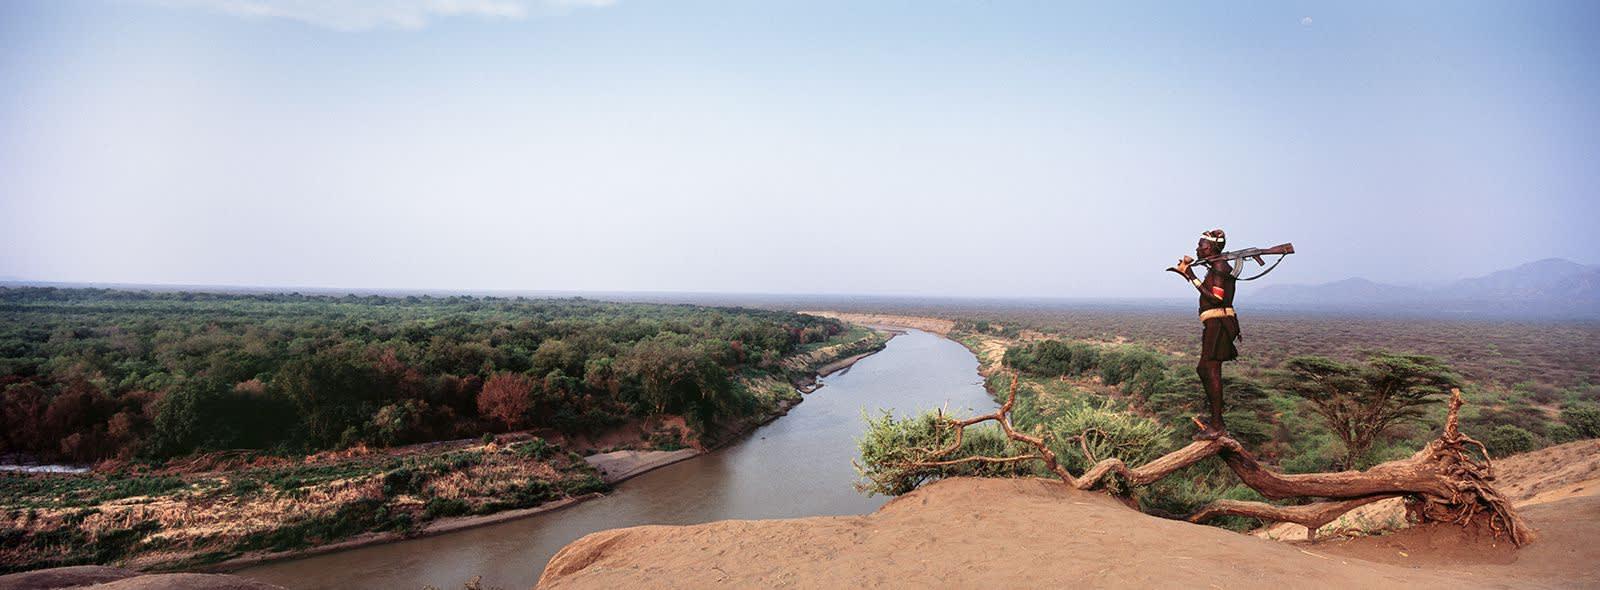 Matjaž Krivic, Omo valley, Ethiopia